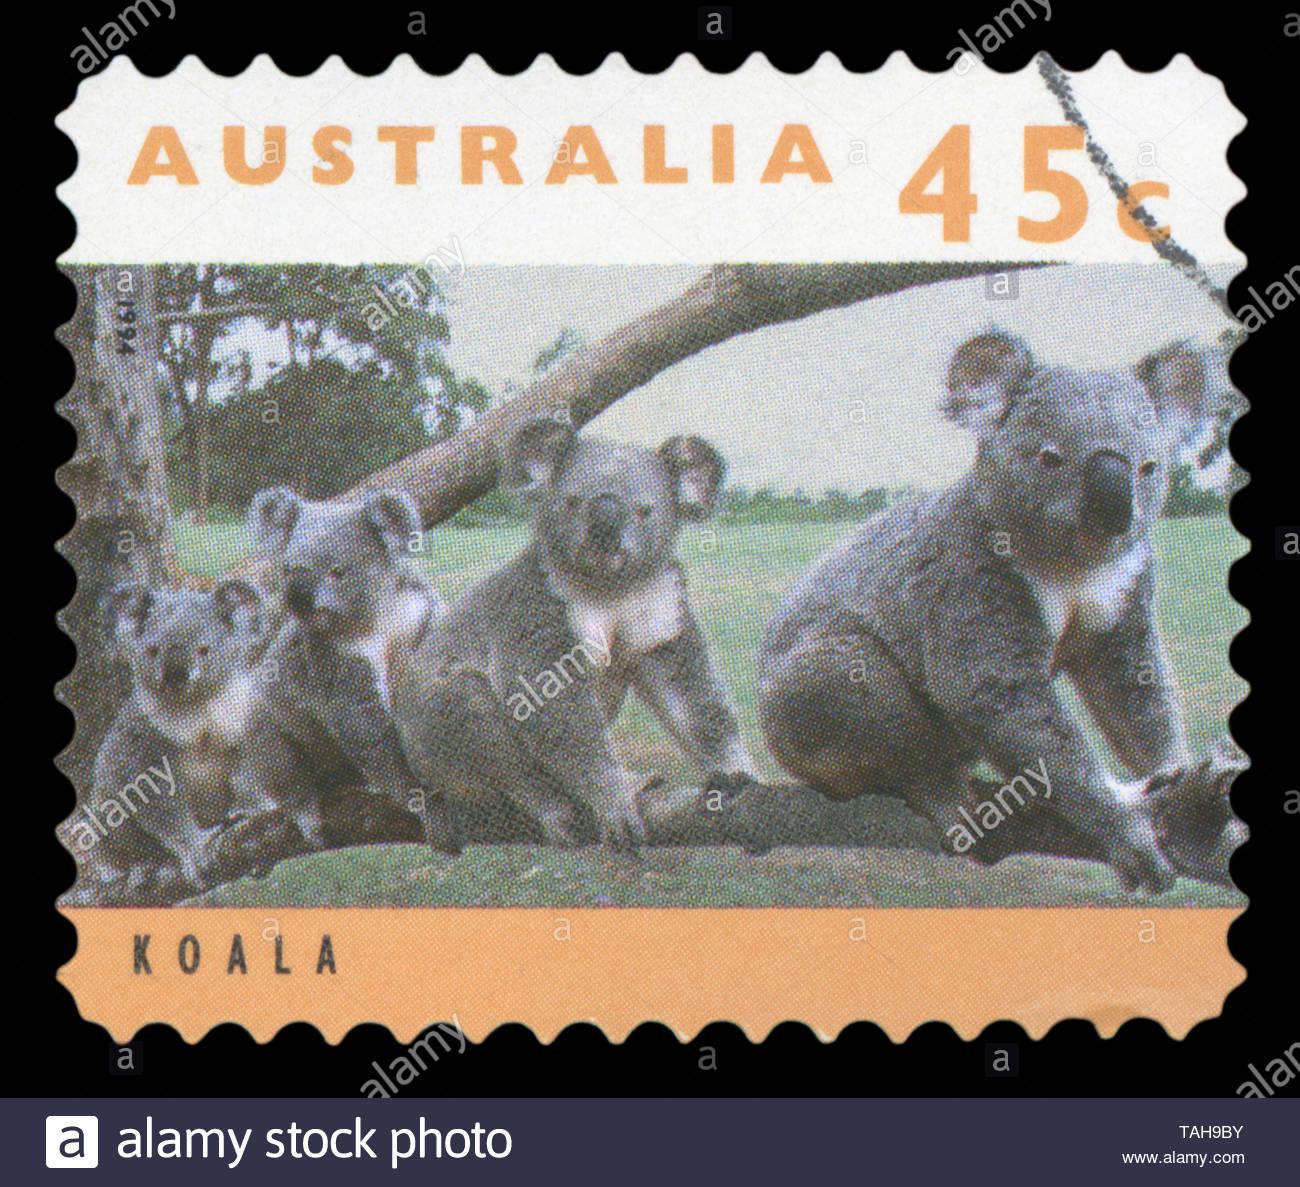 AUSTRALIA - CIRCA 1994: post stamp printed in Australia shows four koalas on tree branch; Scott 1277 45c; circa 1994 - Stock Image